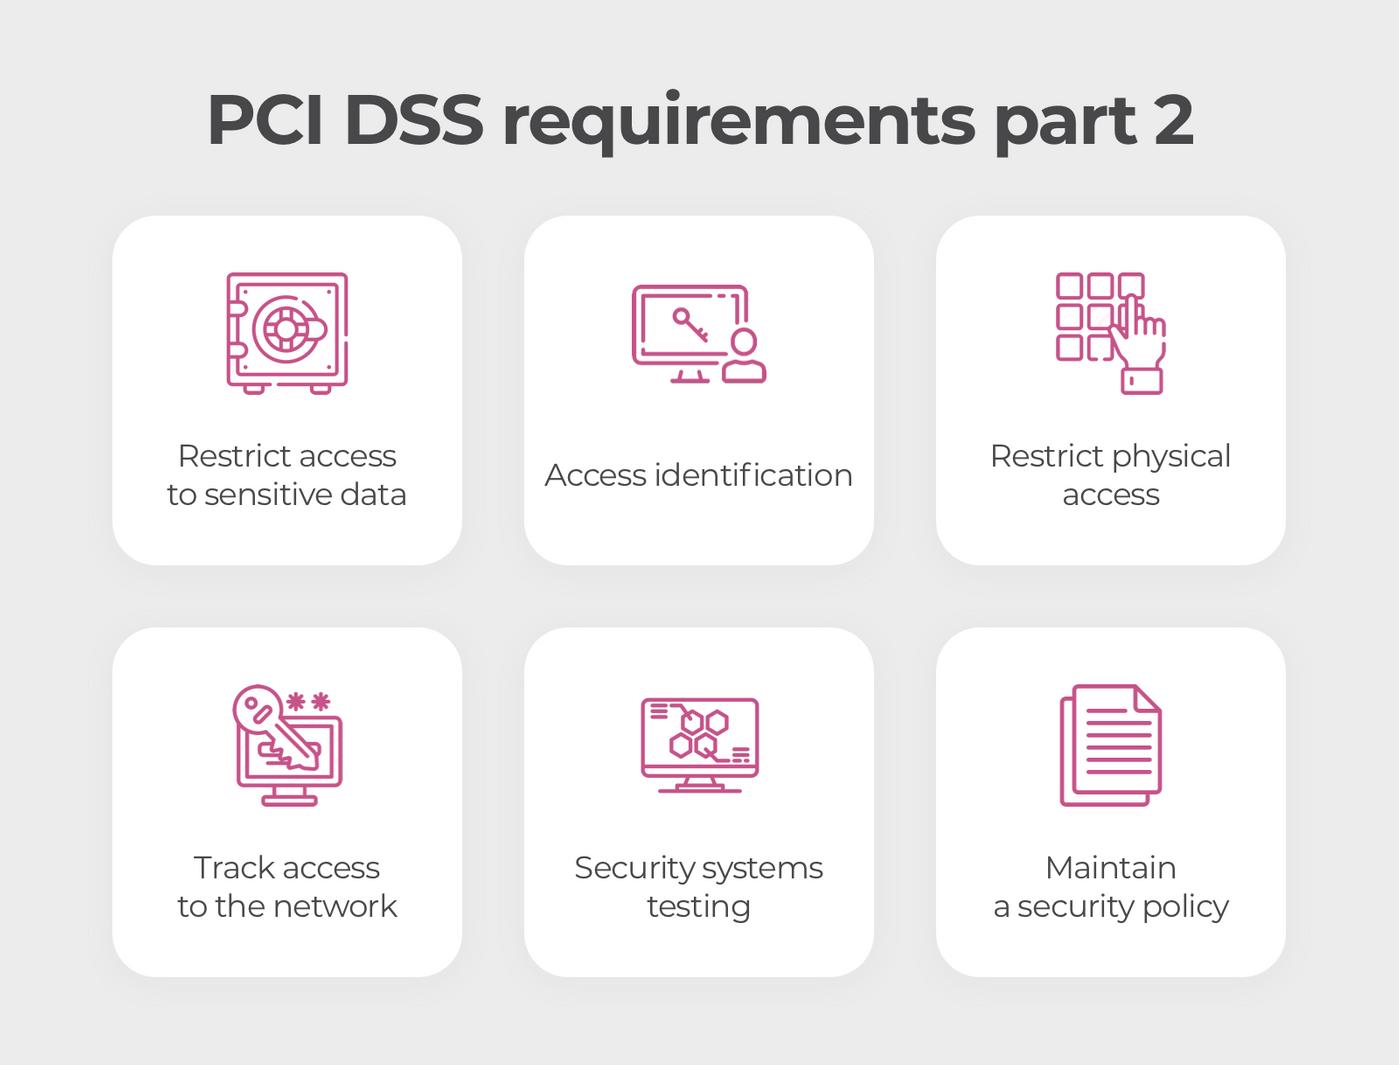 PCI DSS regulations